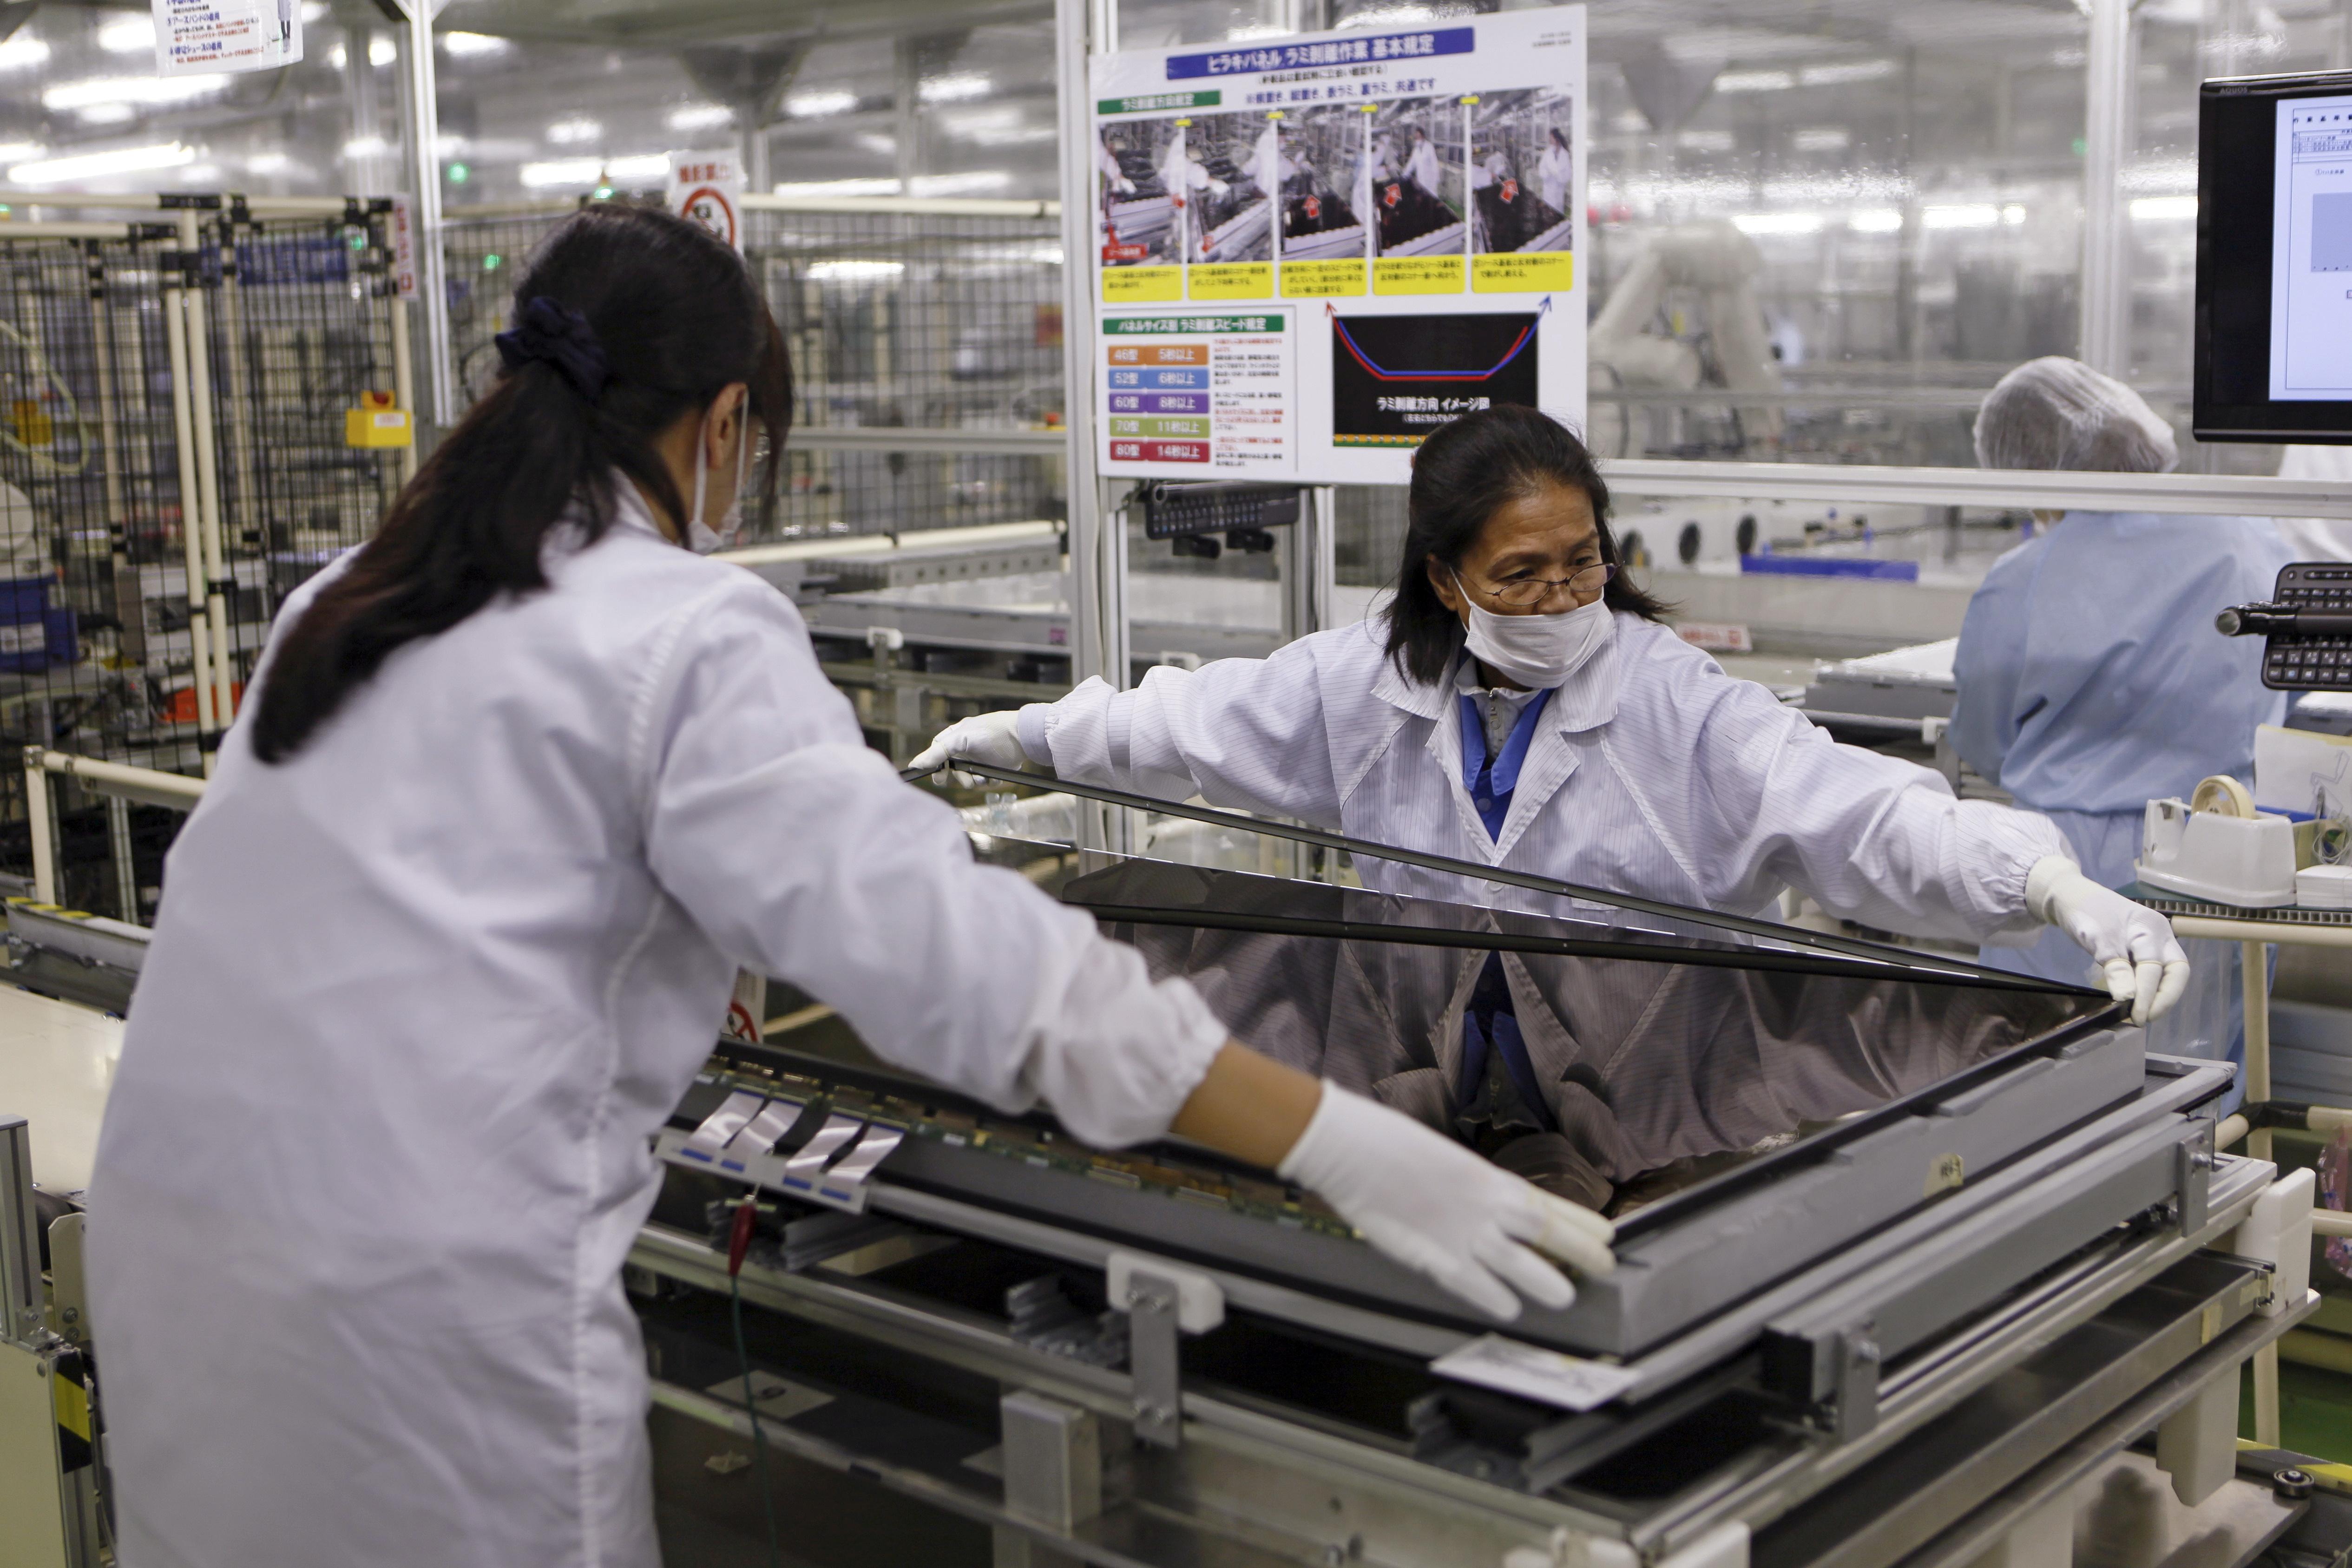 Women assemble an Aquos television at Sharp Corp's Tochigi plant in Yaita, north of Tokyo, November 19, 2015.   REUTERS/Reiji Murai/Files